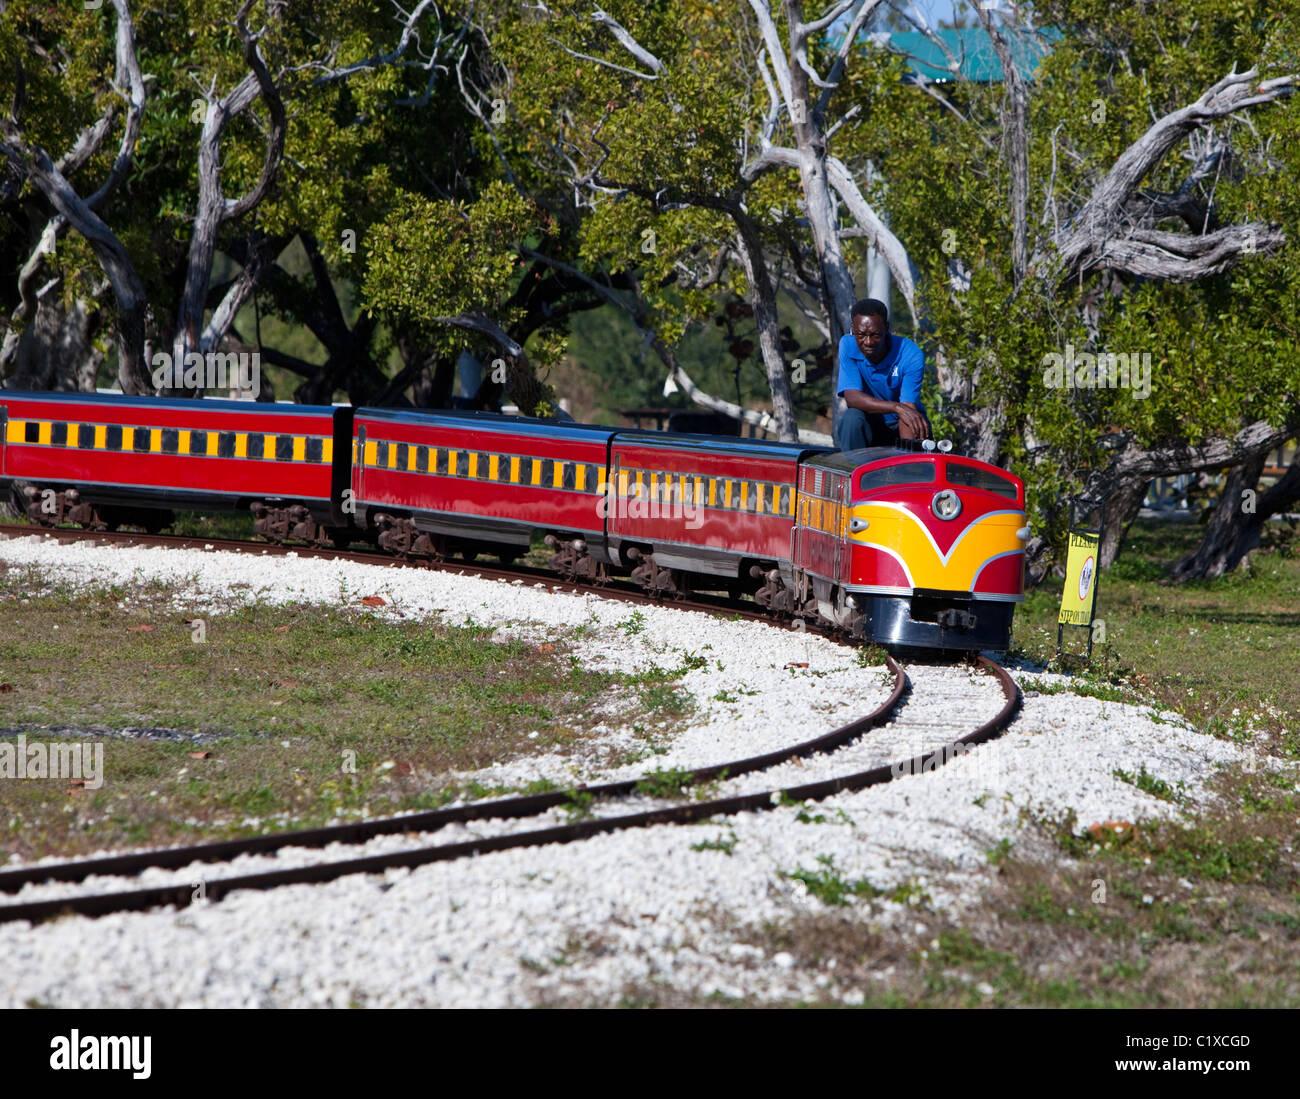 Man on electric train Stock Photo